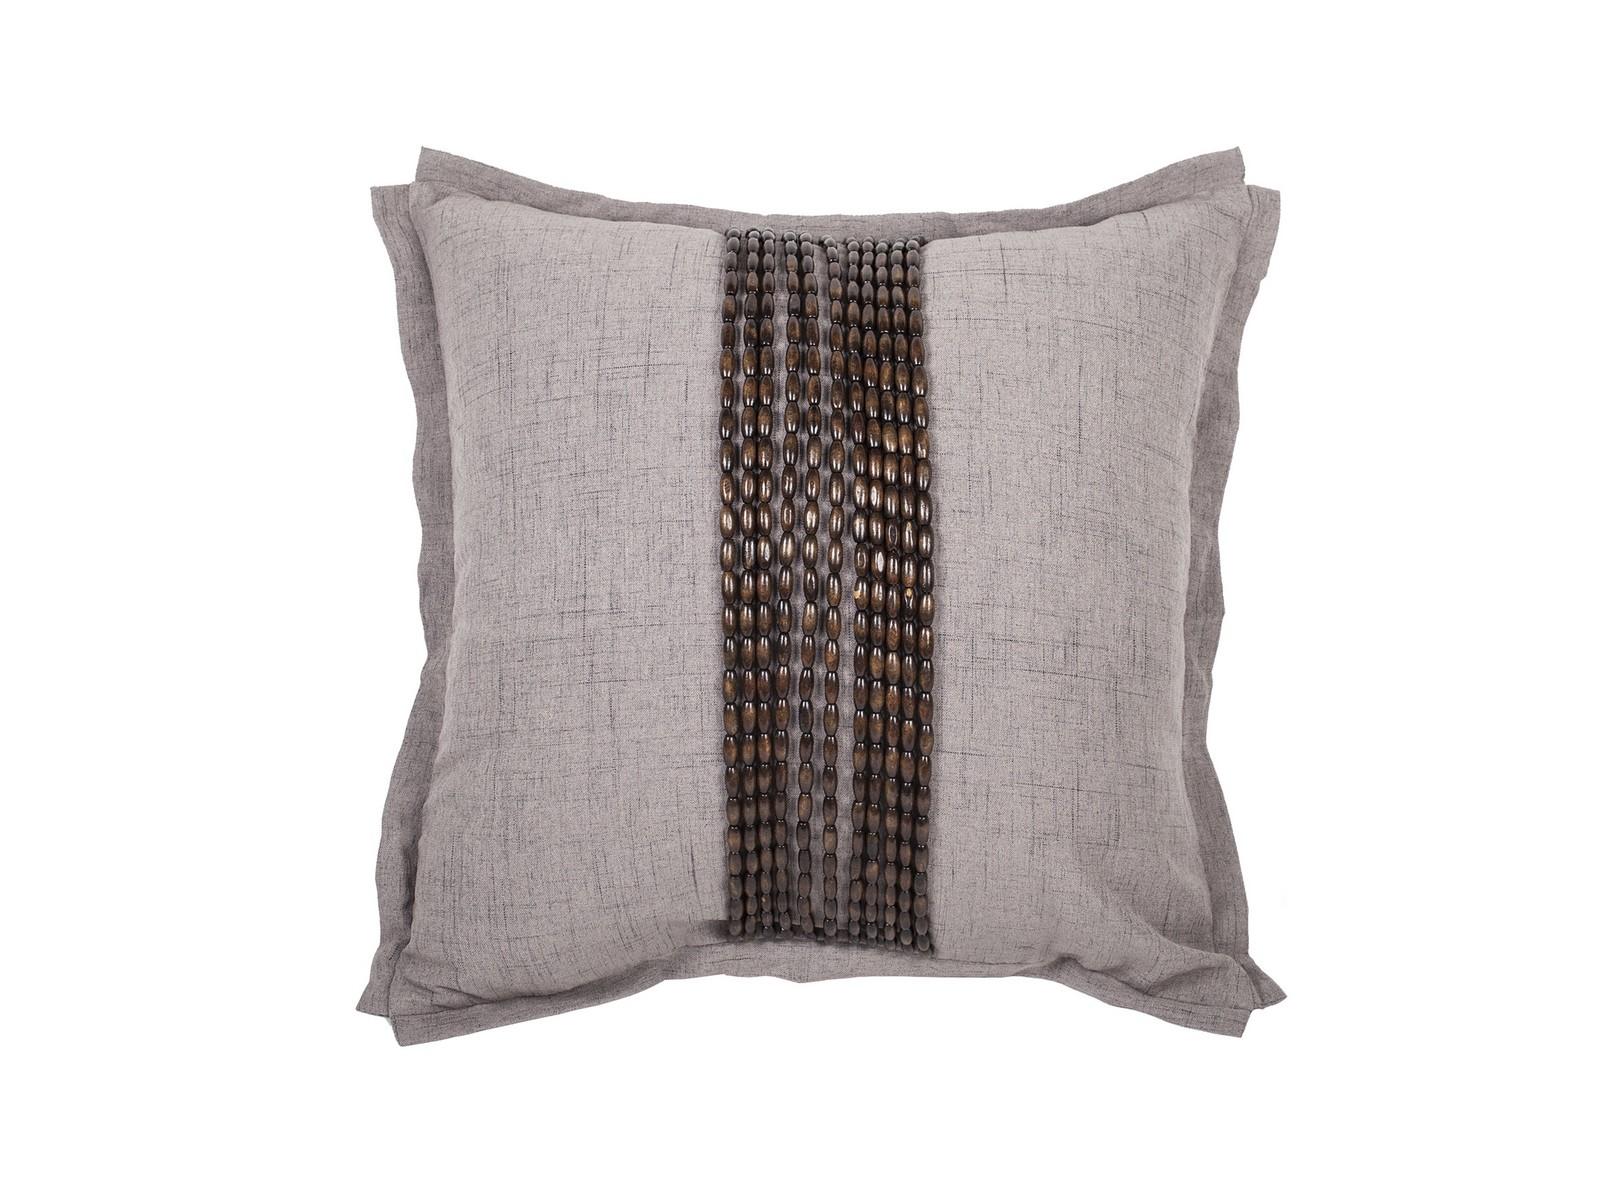 Декоративная подушка Handwork ExclusiveКвадратные подушки и наволочки<br>Ручное декорирование.<br><br>Material: Лен<br>Length см: None<br>Width см: 45<br>Depth см: 4<br>Height см: 45